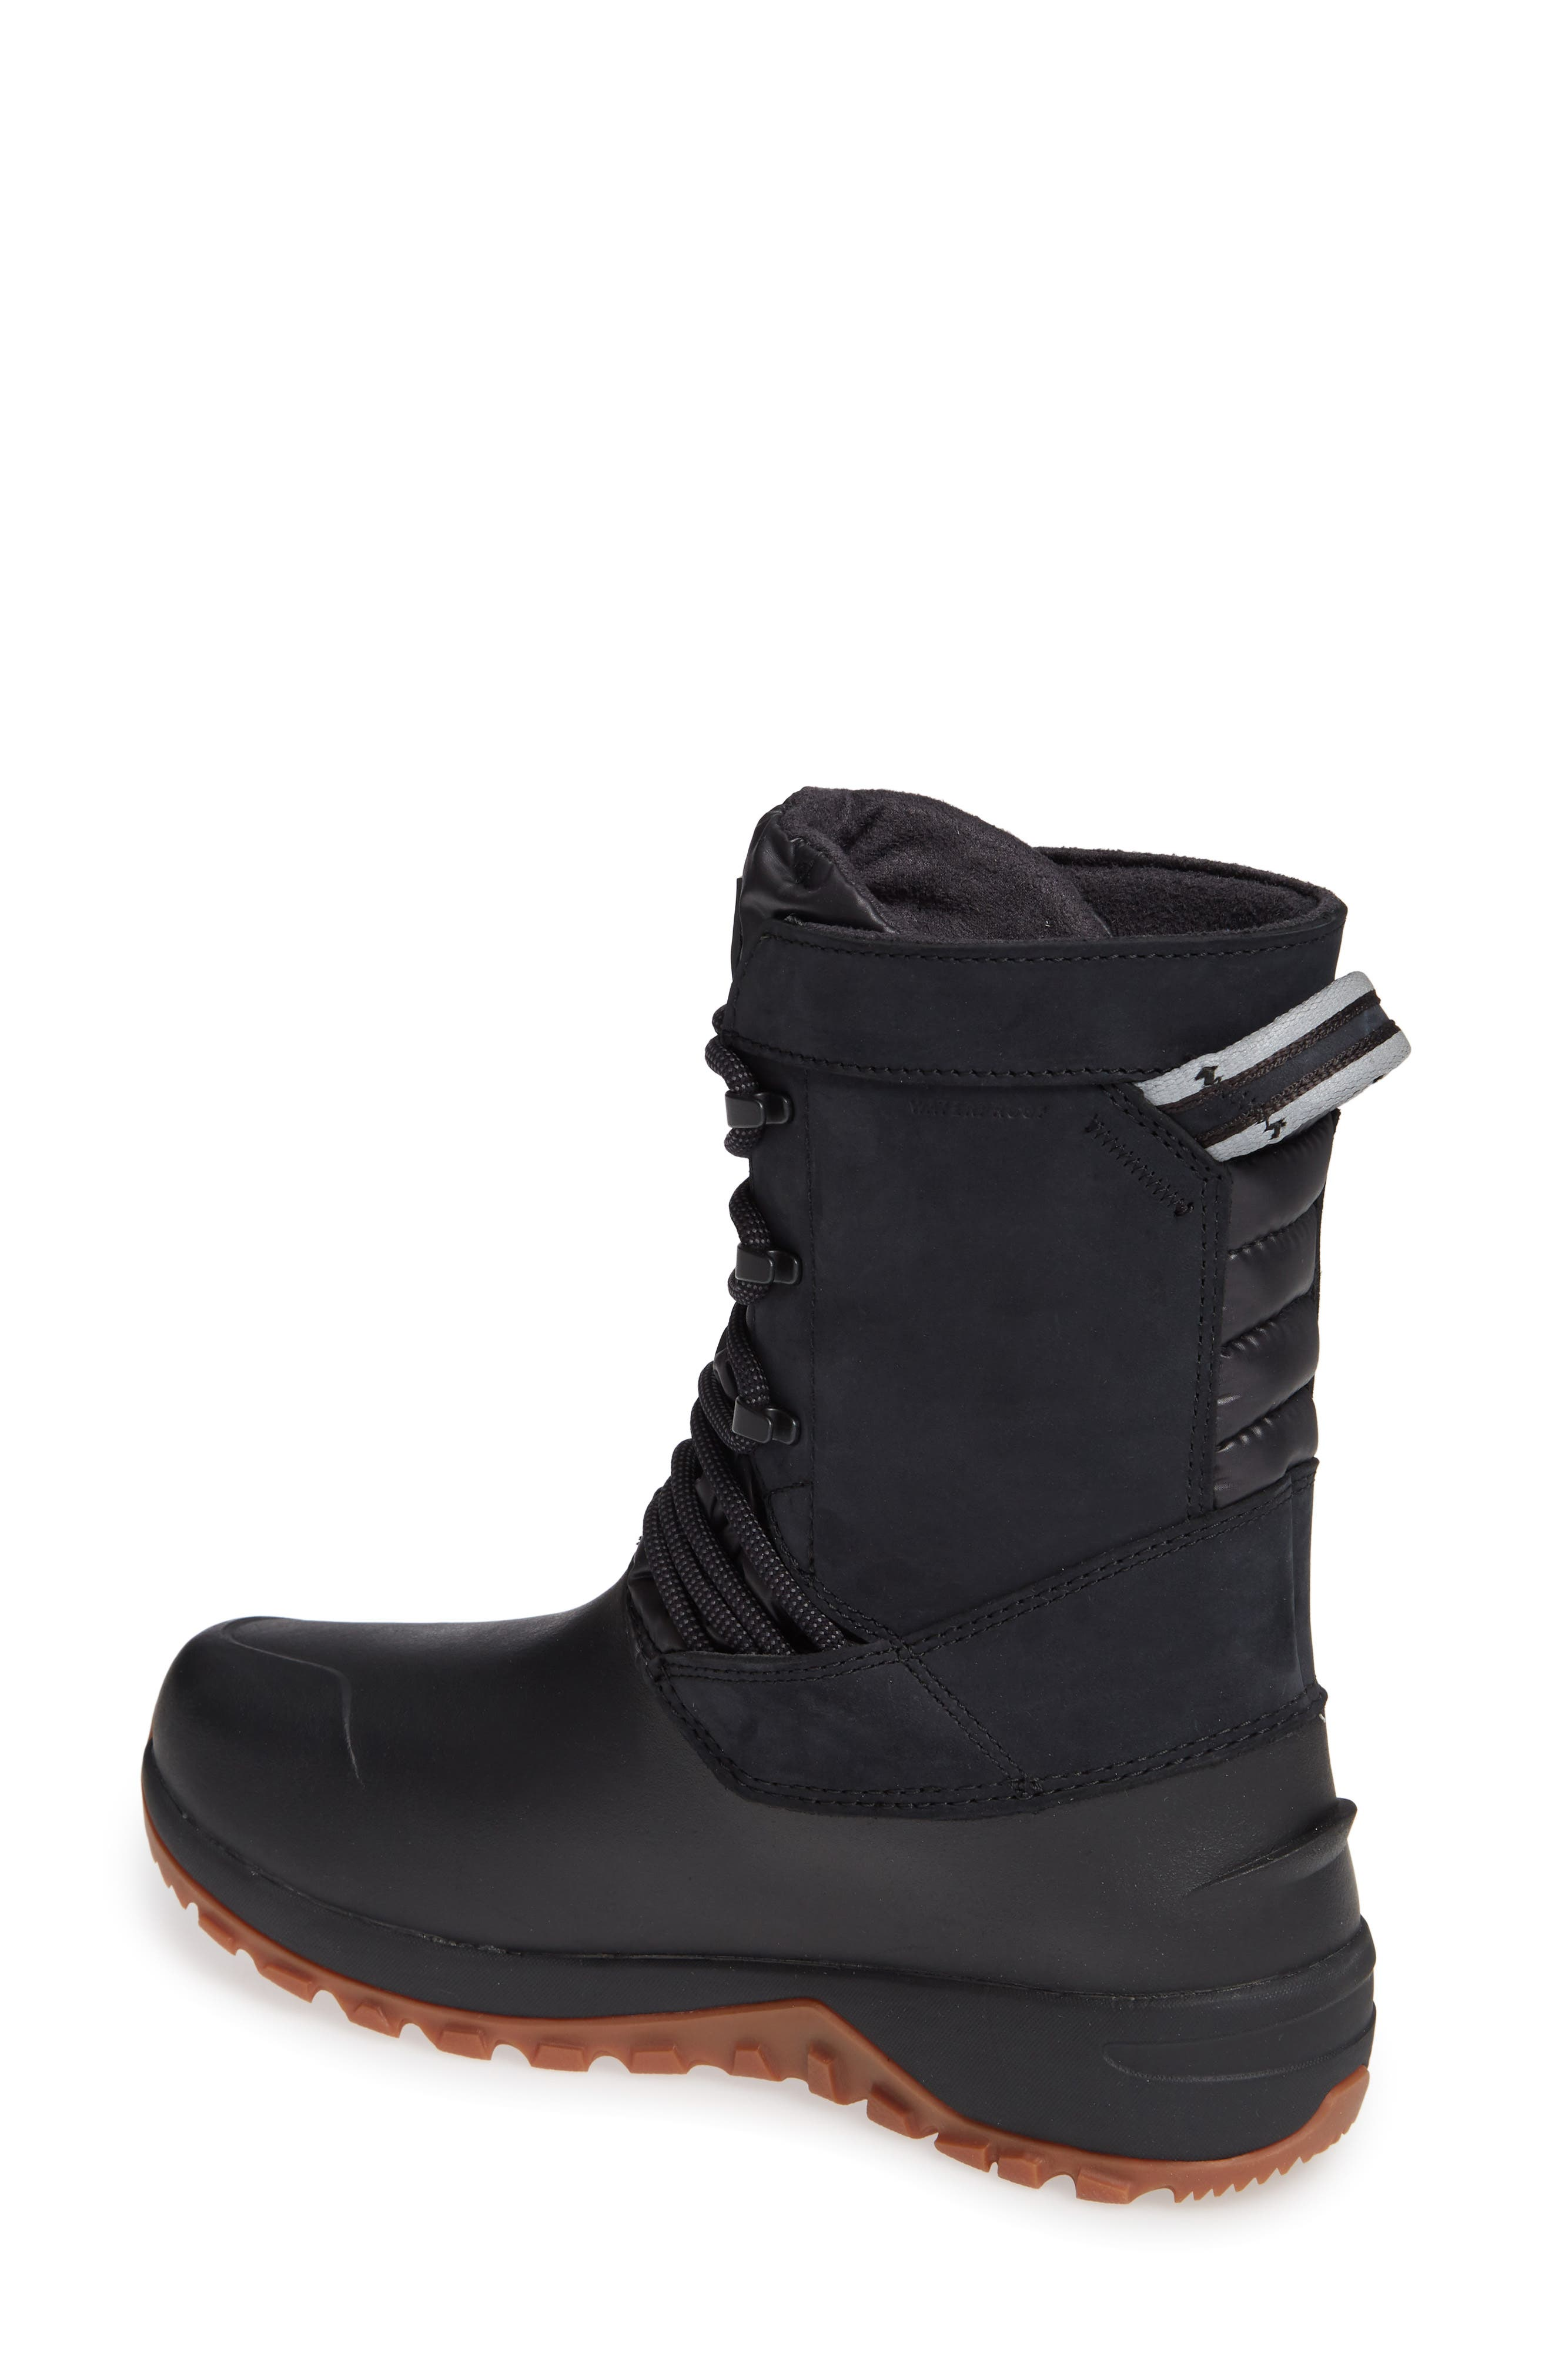 Yukiona Waterproof Winter Boot,                             Alternate thumbnail 2, color,                             BLACK/ BLACK